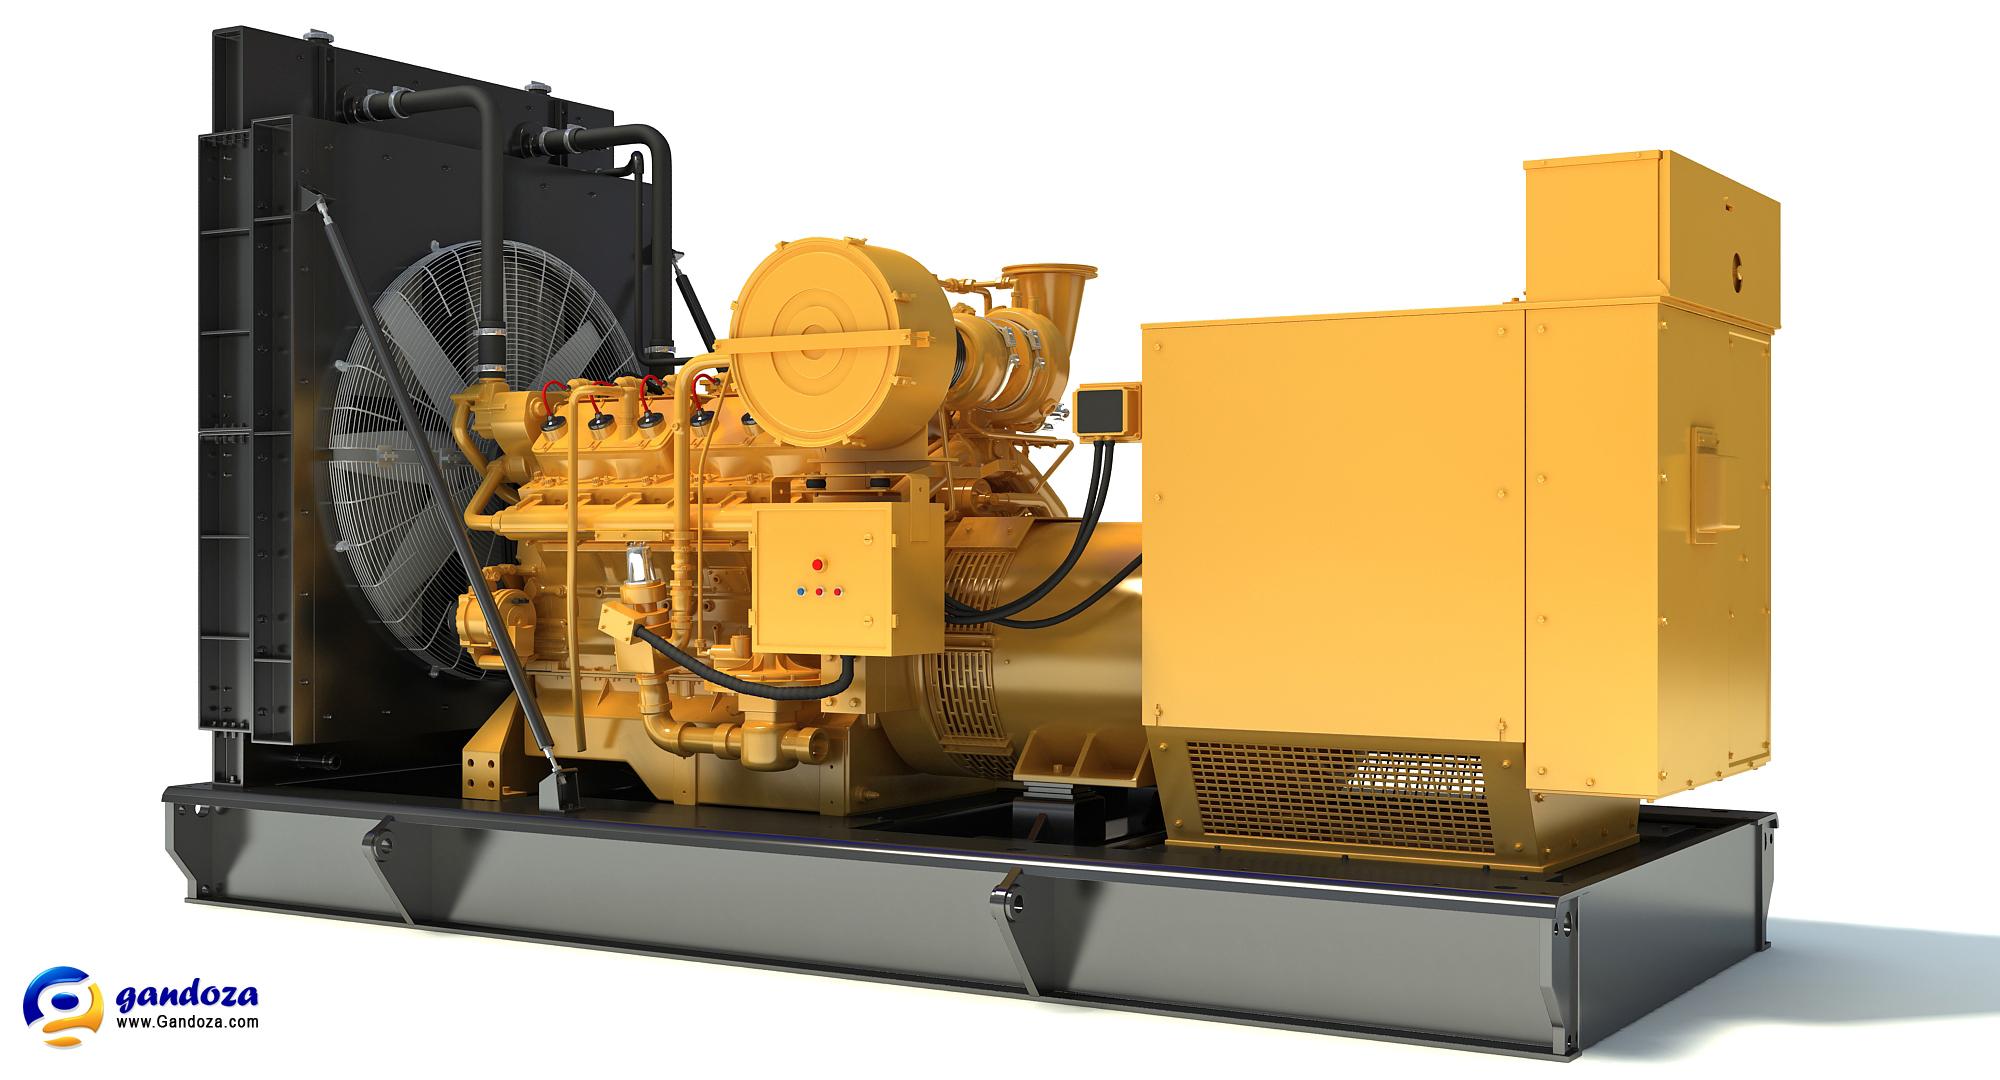 Caterpillar Gas Generator 3D Engine Model by Gandoza on